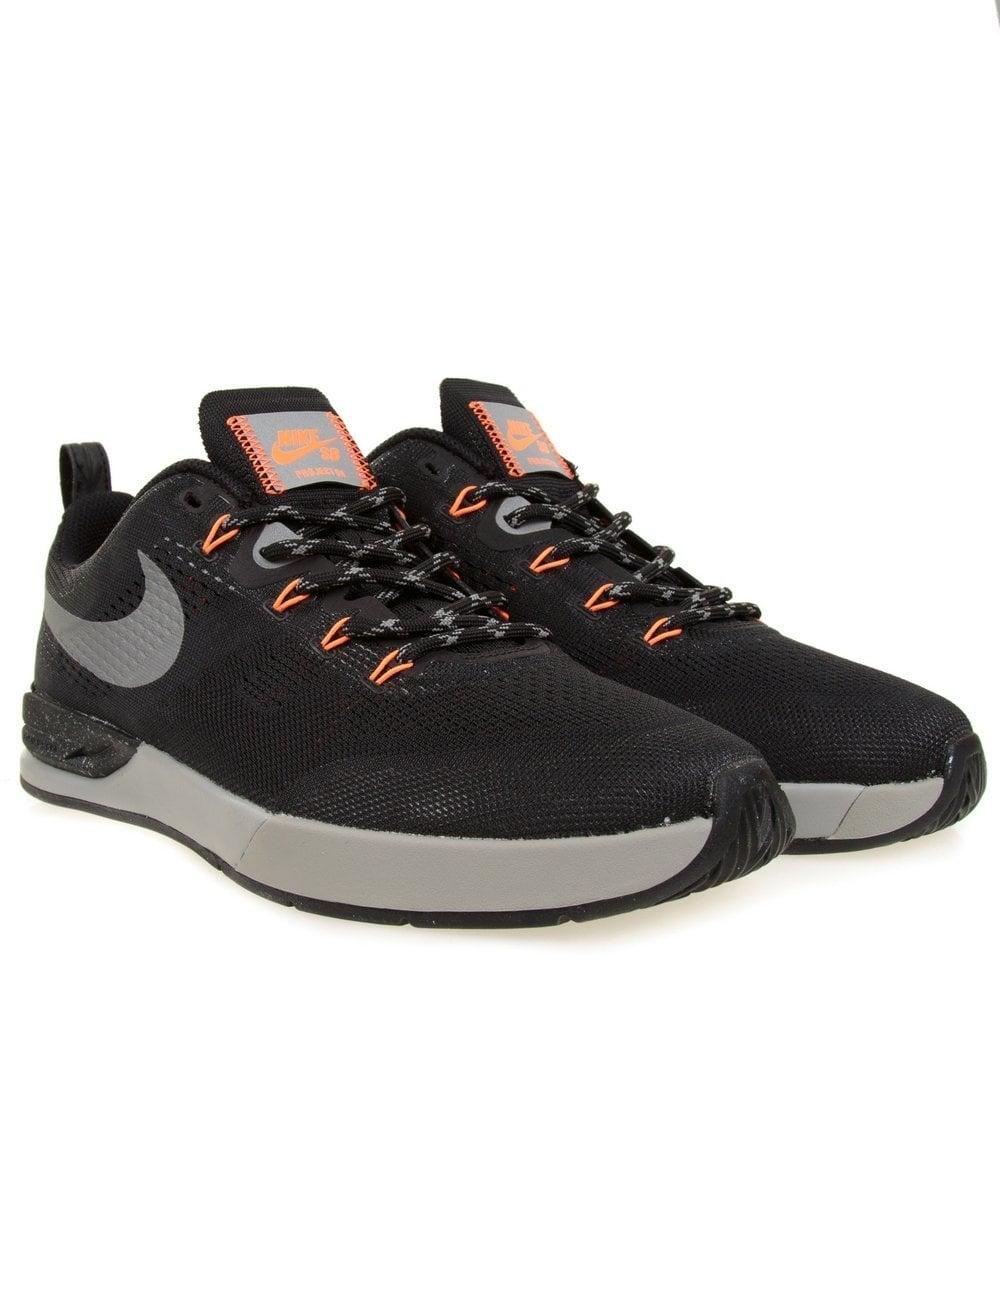 d954fef45283 Nike SB Project BA R R - Shield Black Silver Reflective - Footwear ...